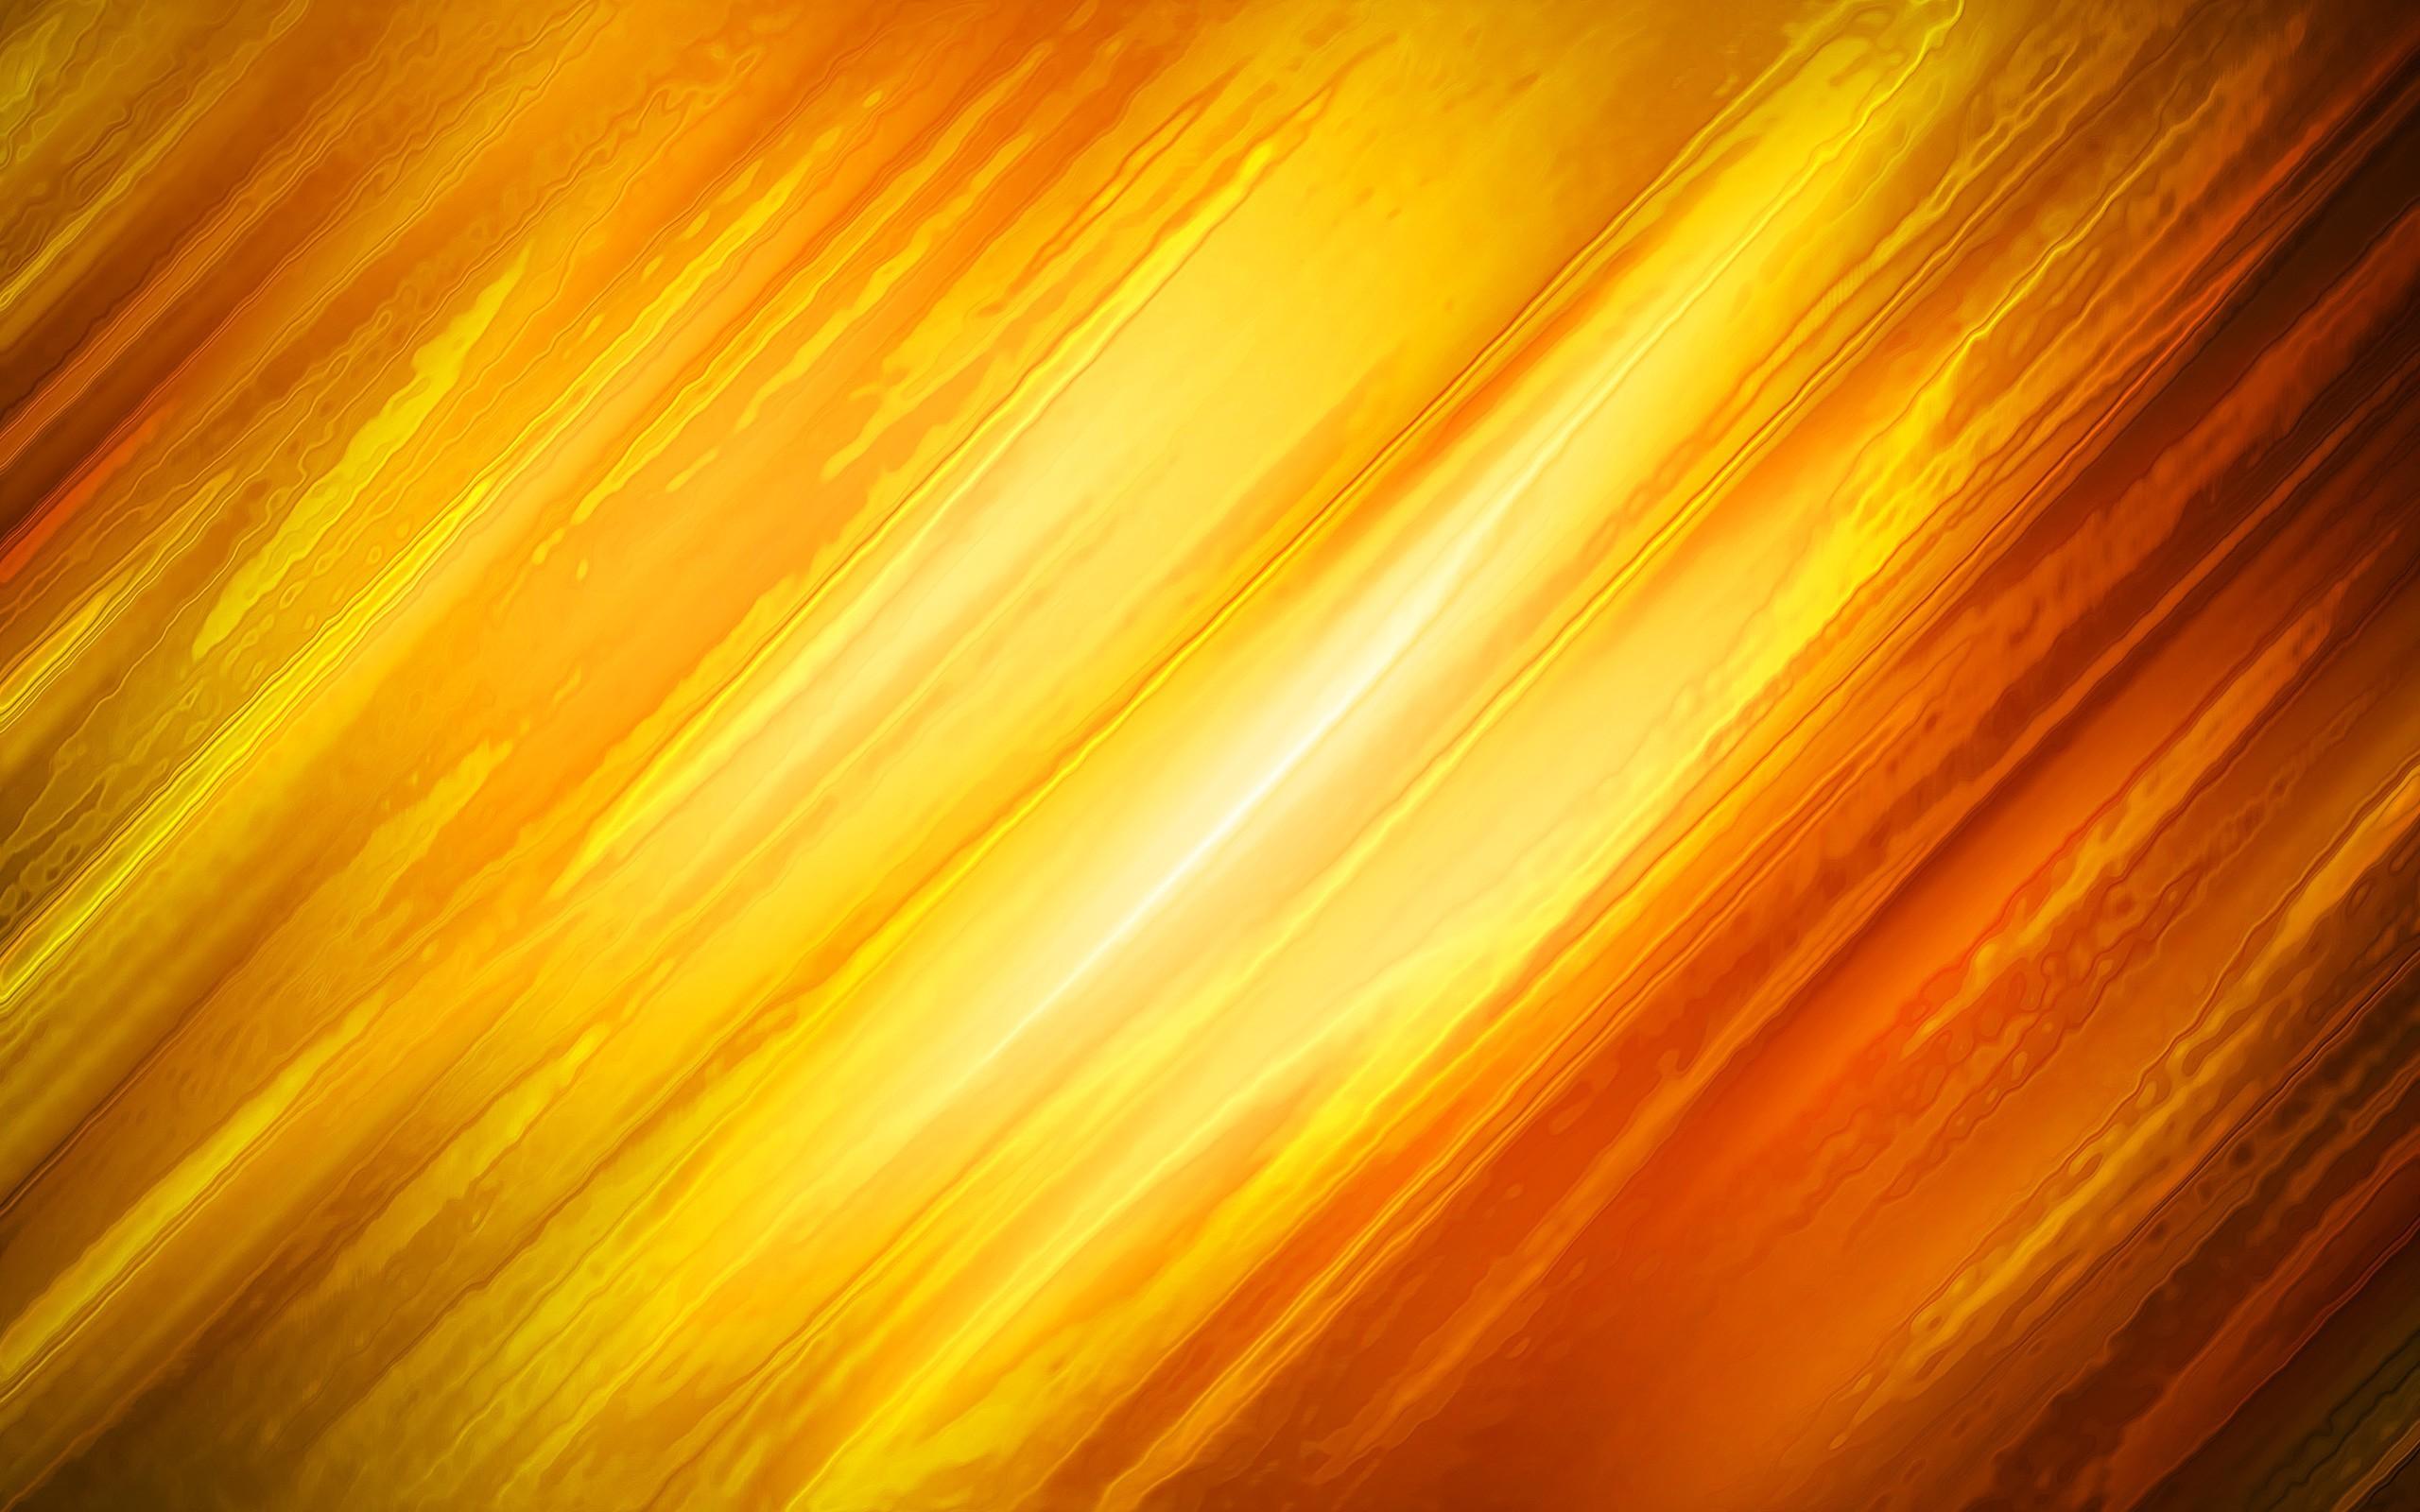 Yellow Orange Background – 1771904